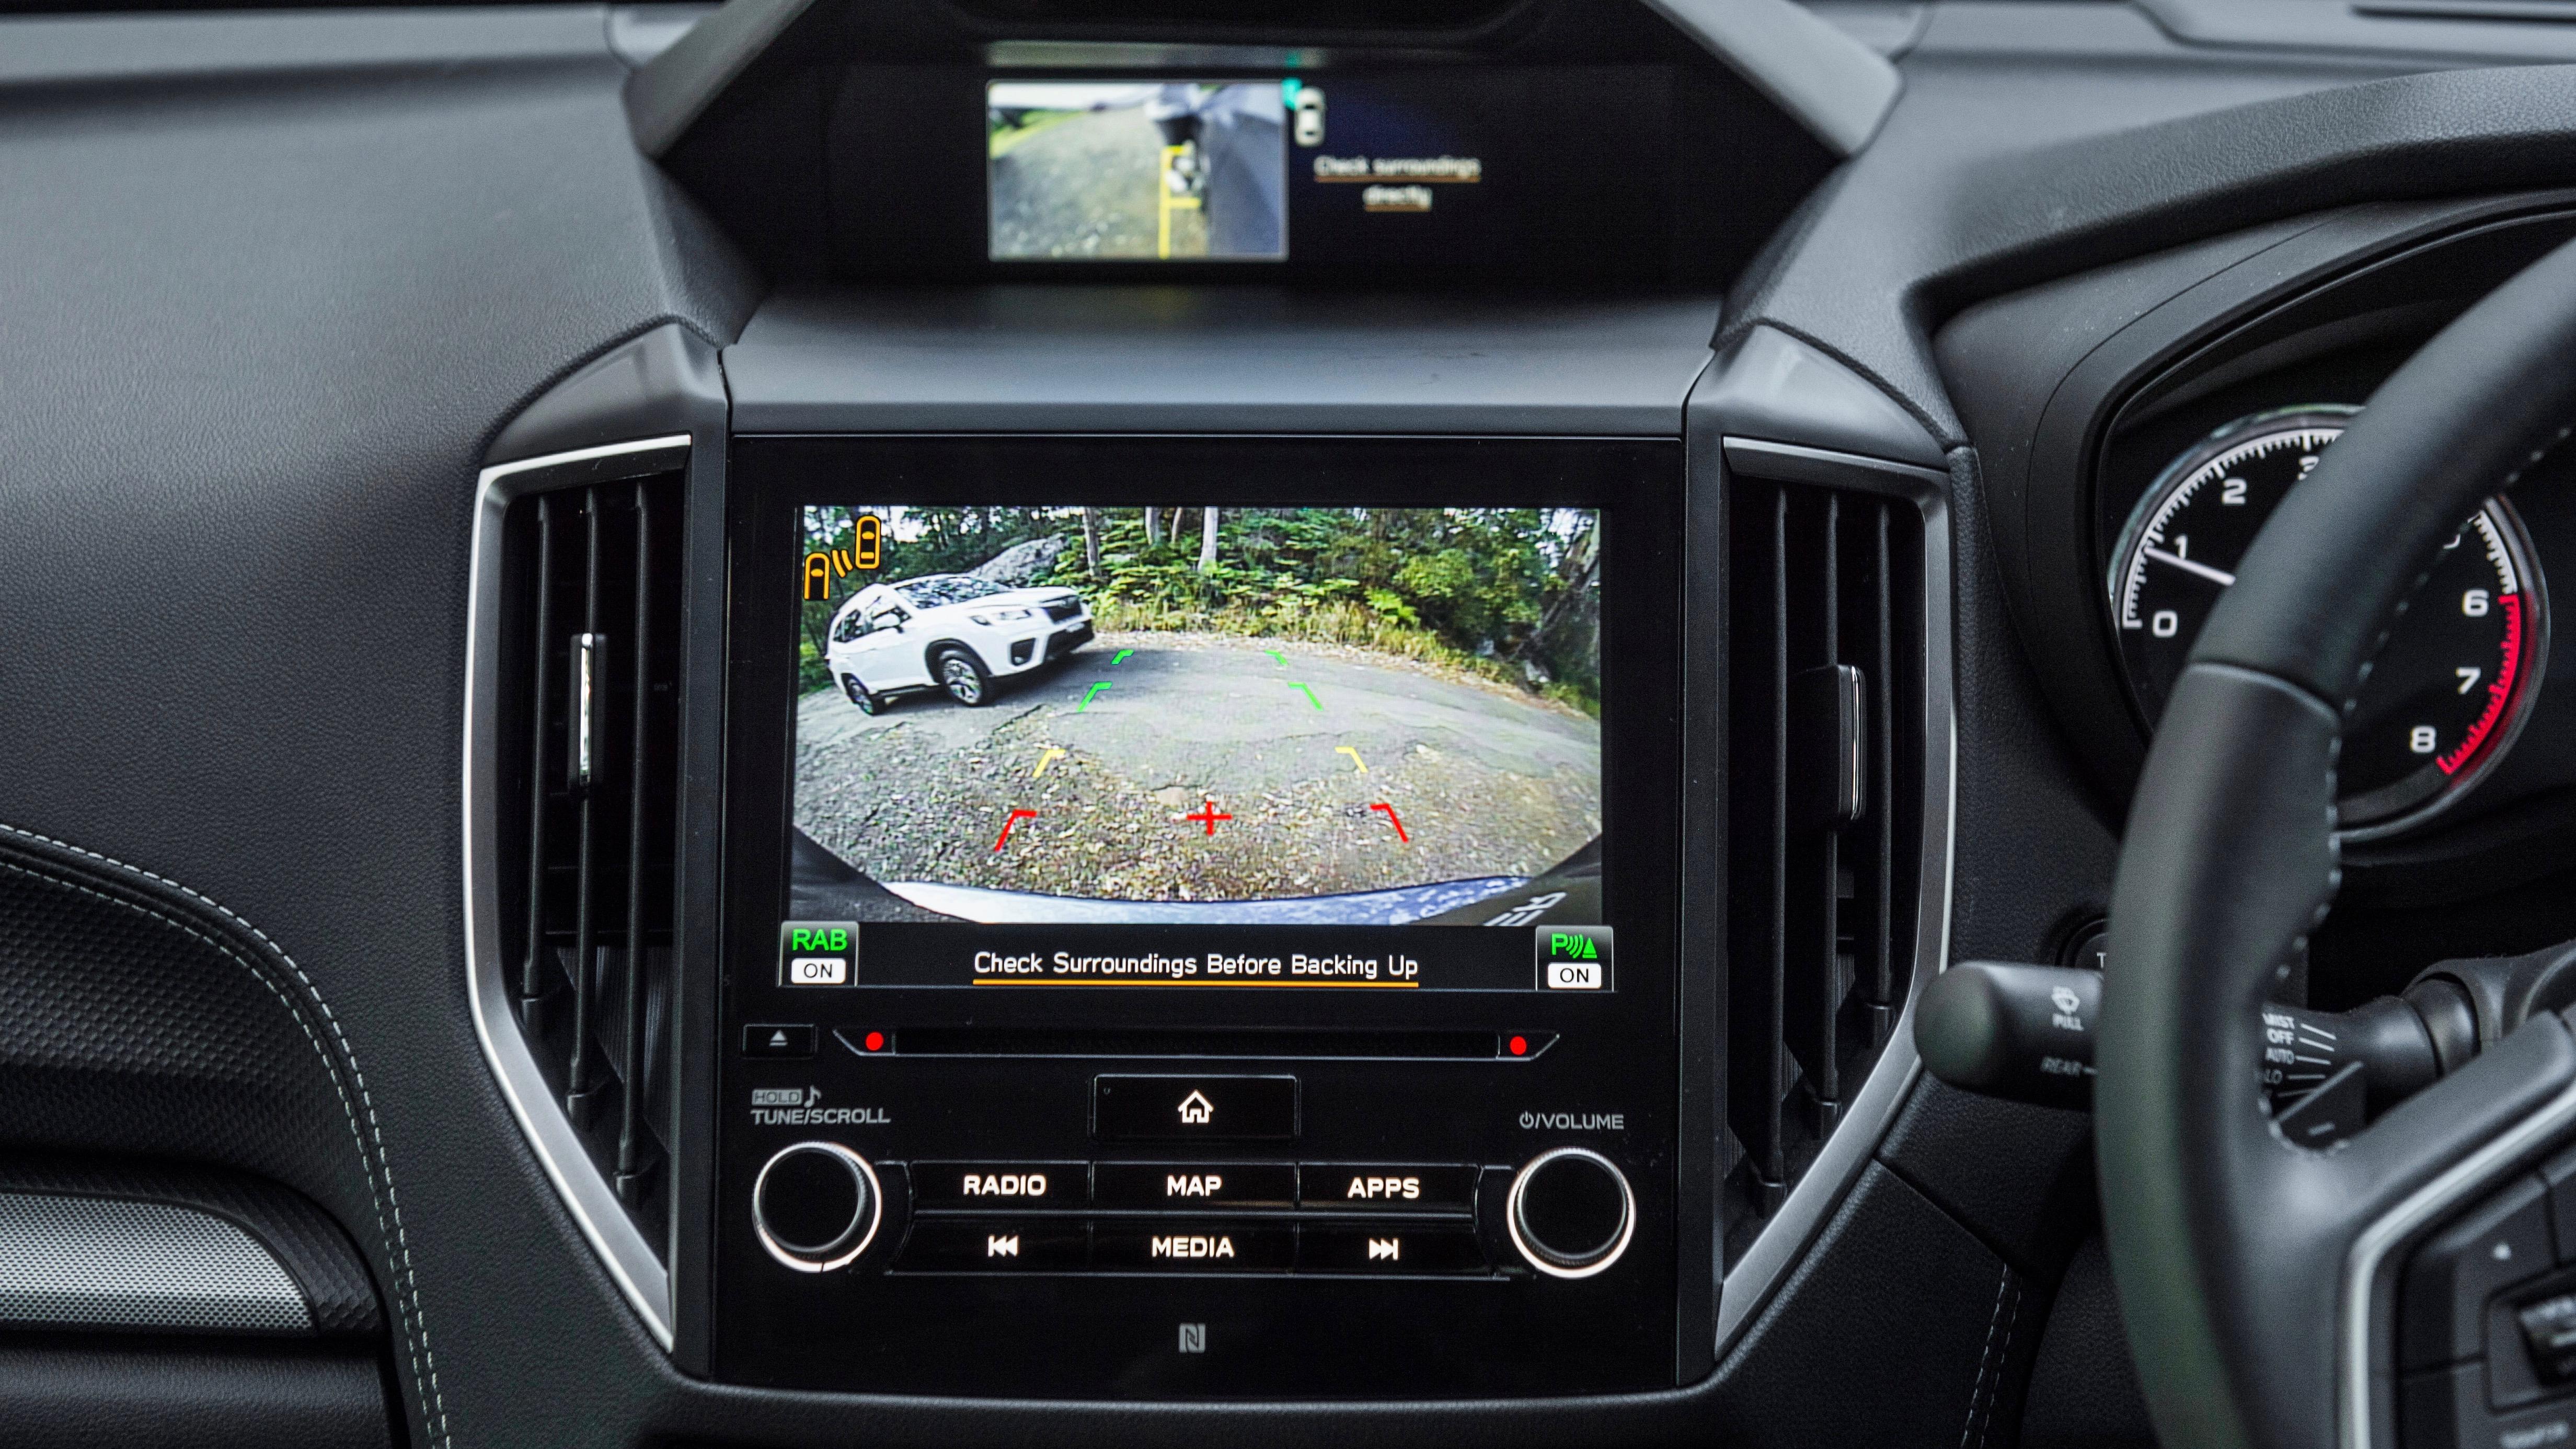 2019 Subaru Forester rear camera